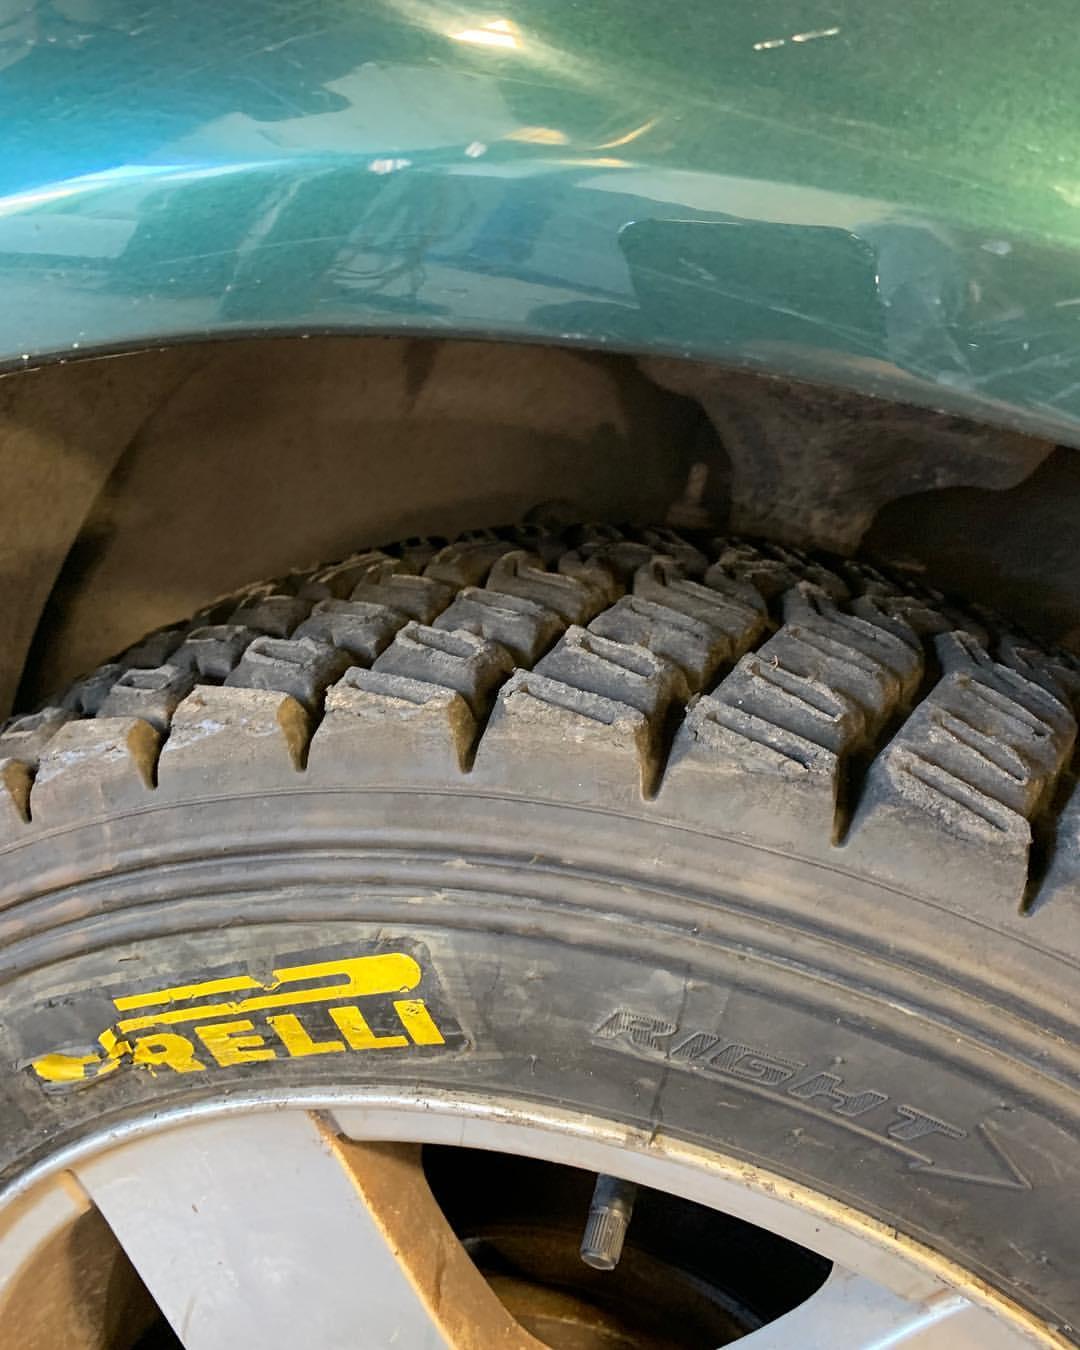 Rally Ready VW Golf Tires - Good 2 Go Tirecraft Auto Centre